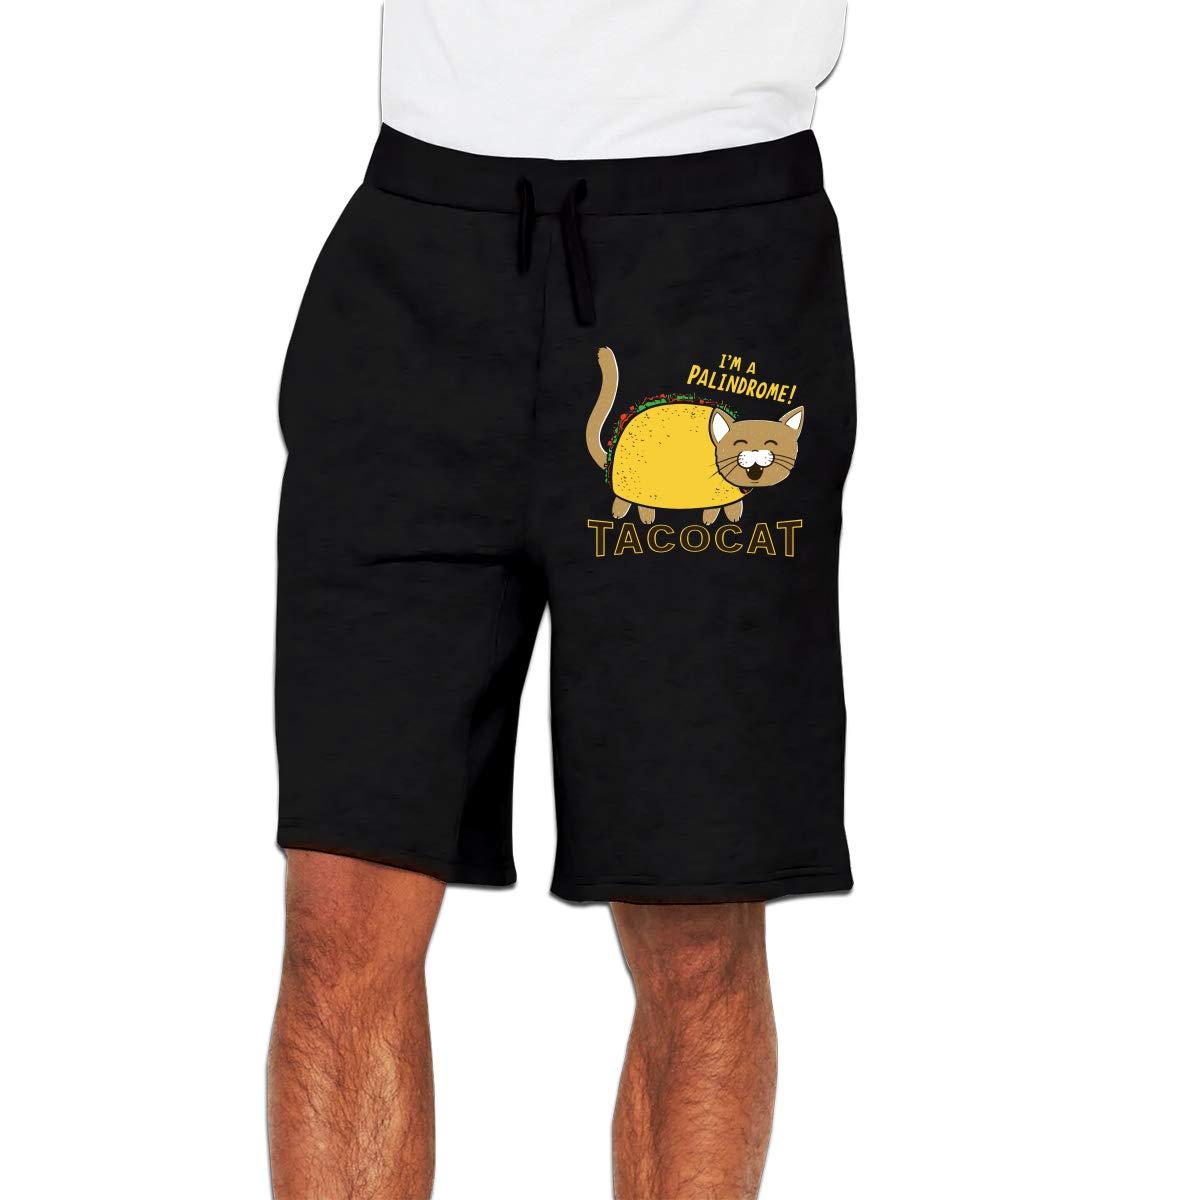 Mens Shorts with Elastic Waist Drawstring Casual Sports Shorts Taco Cat Patterned Gym Jogging Shorts